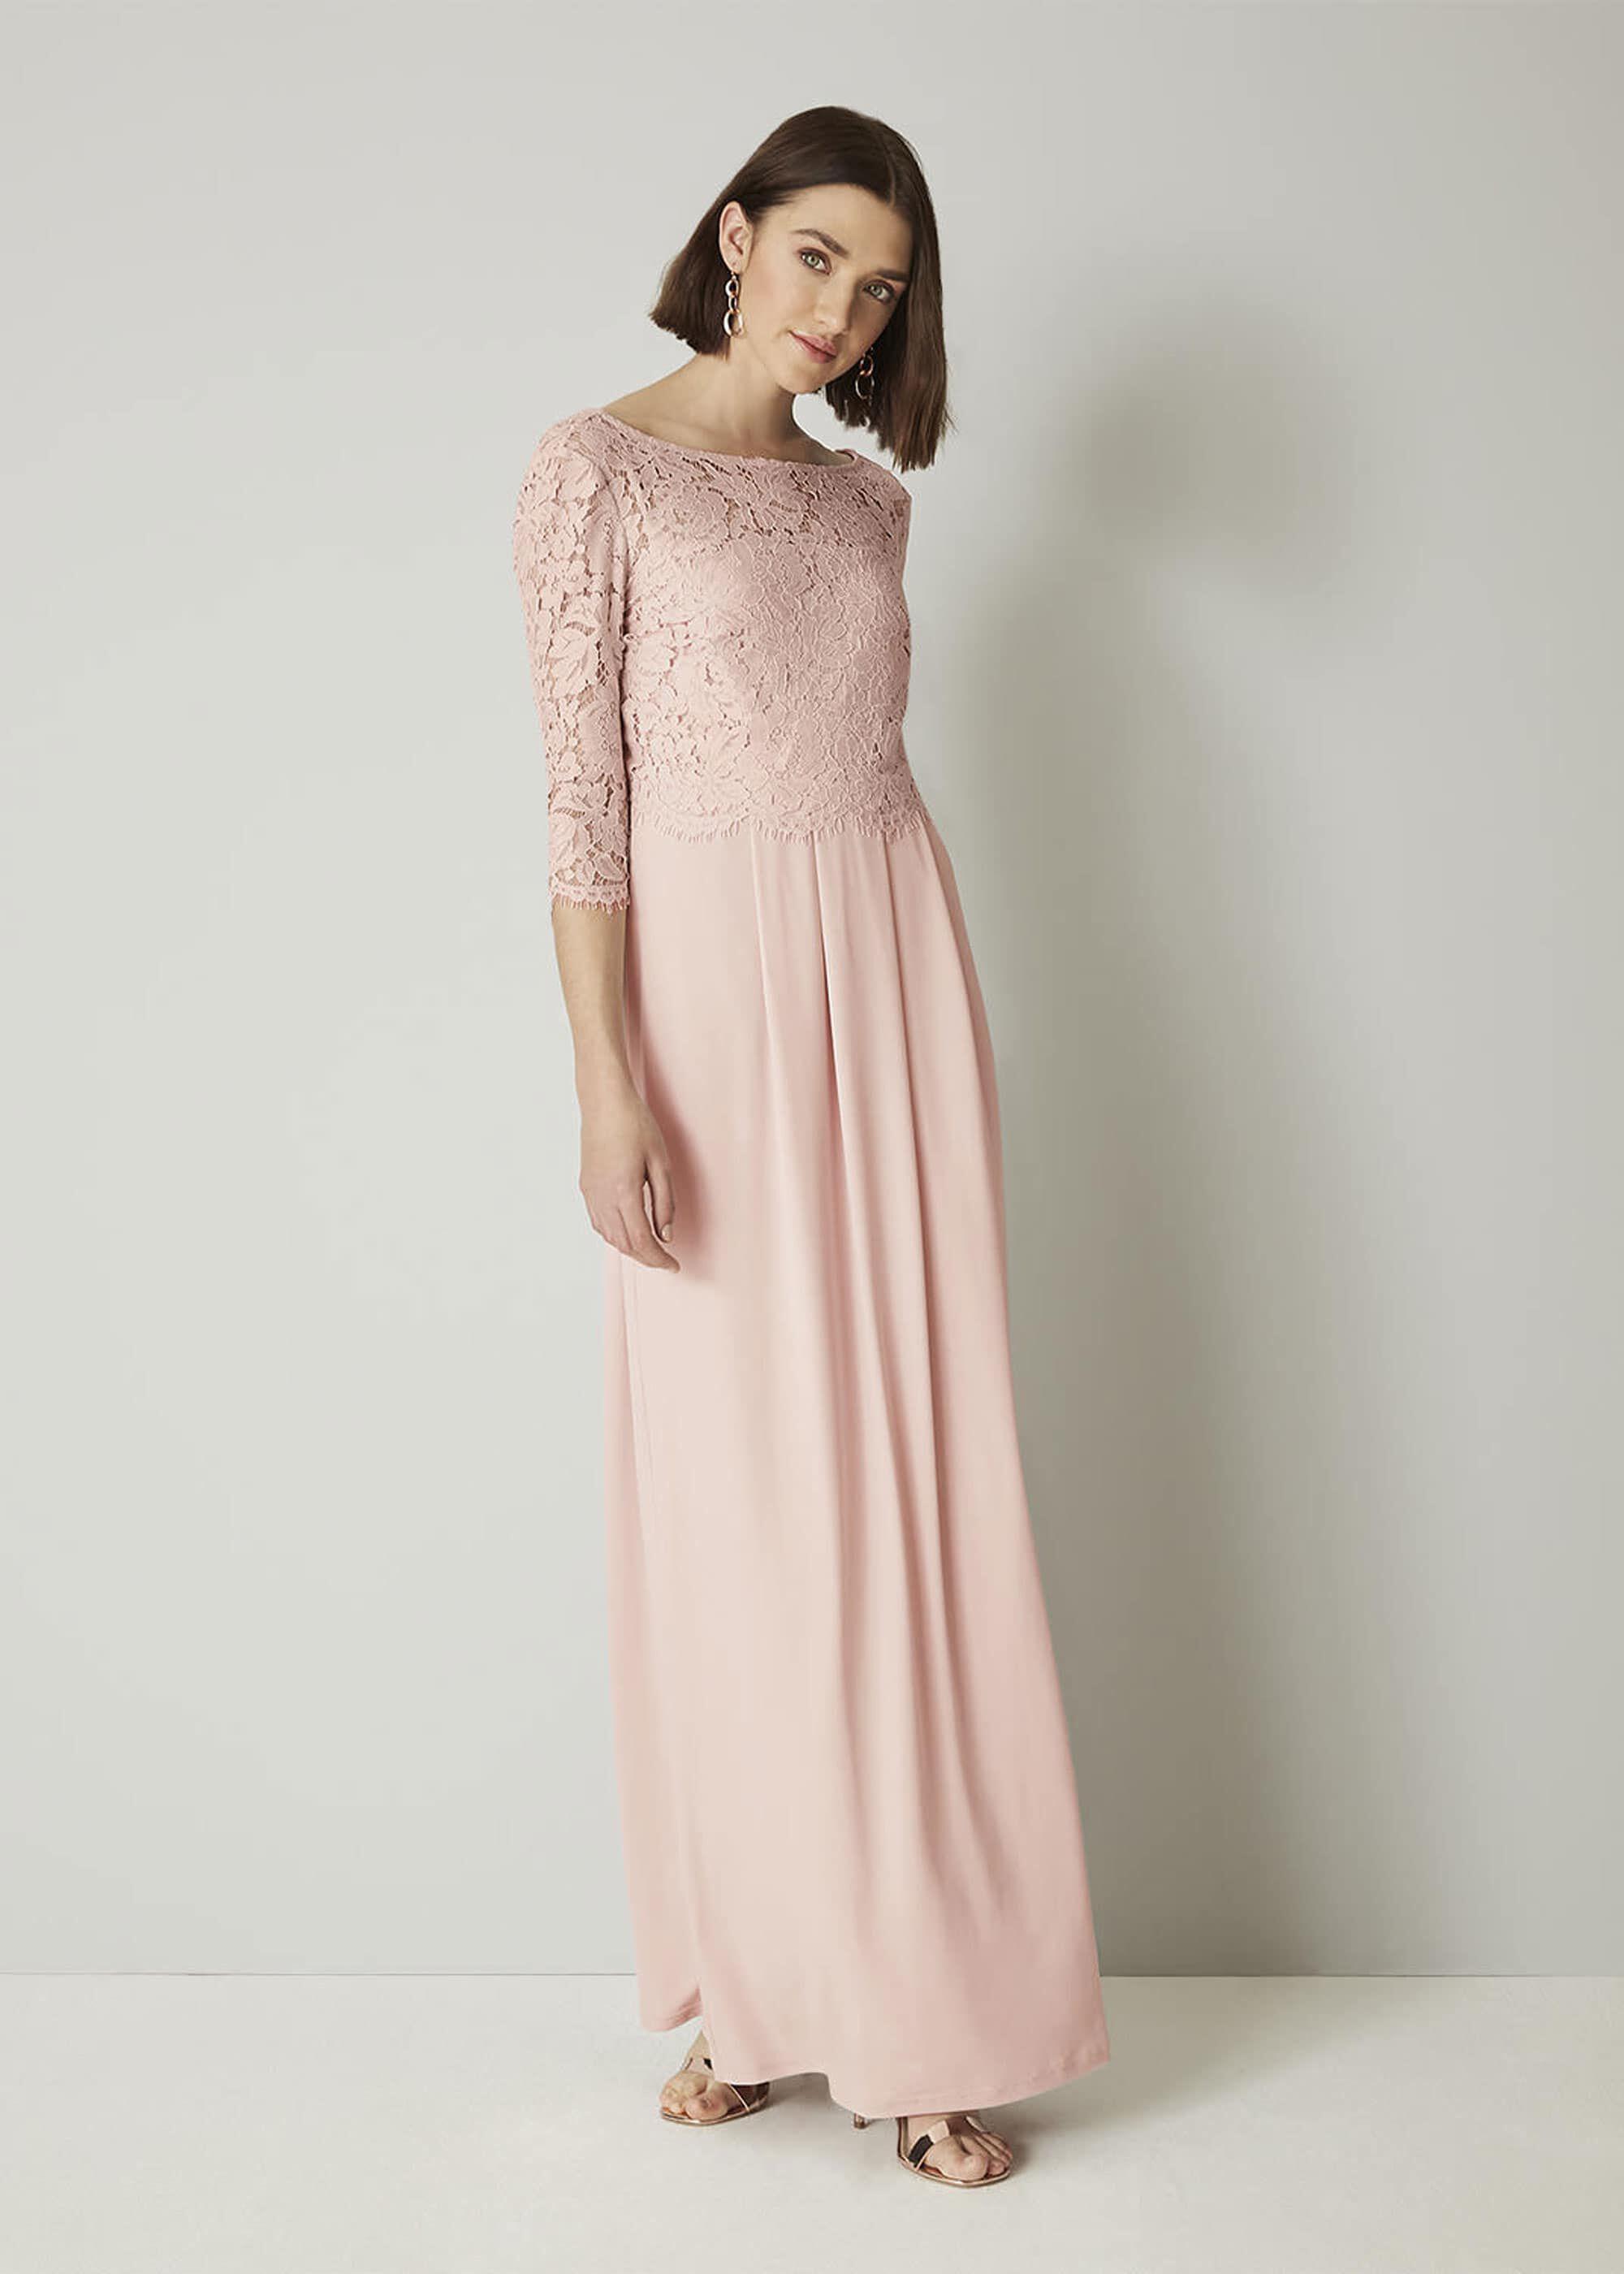 Portia Lace Maxi Bridesmaid Dress | Phase